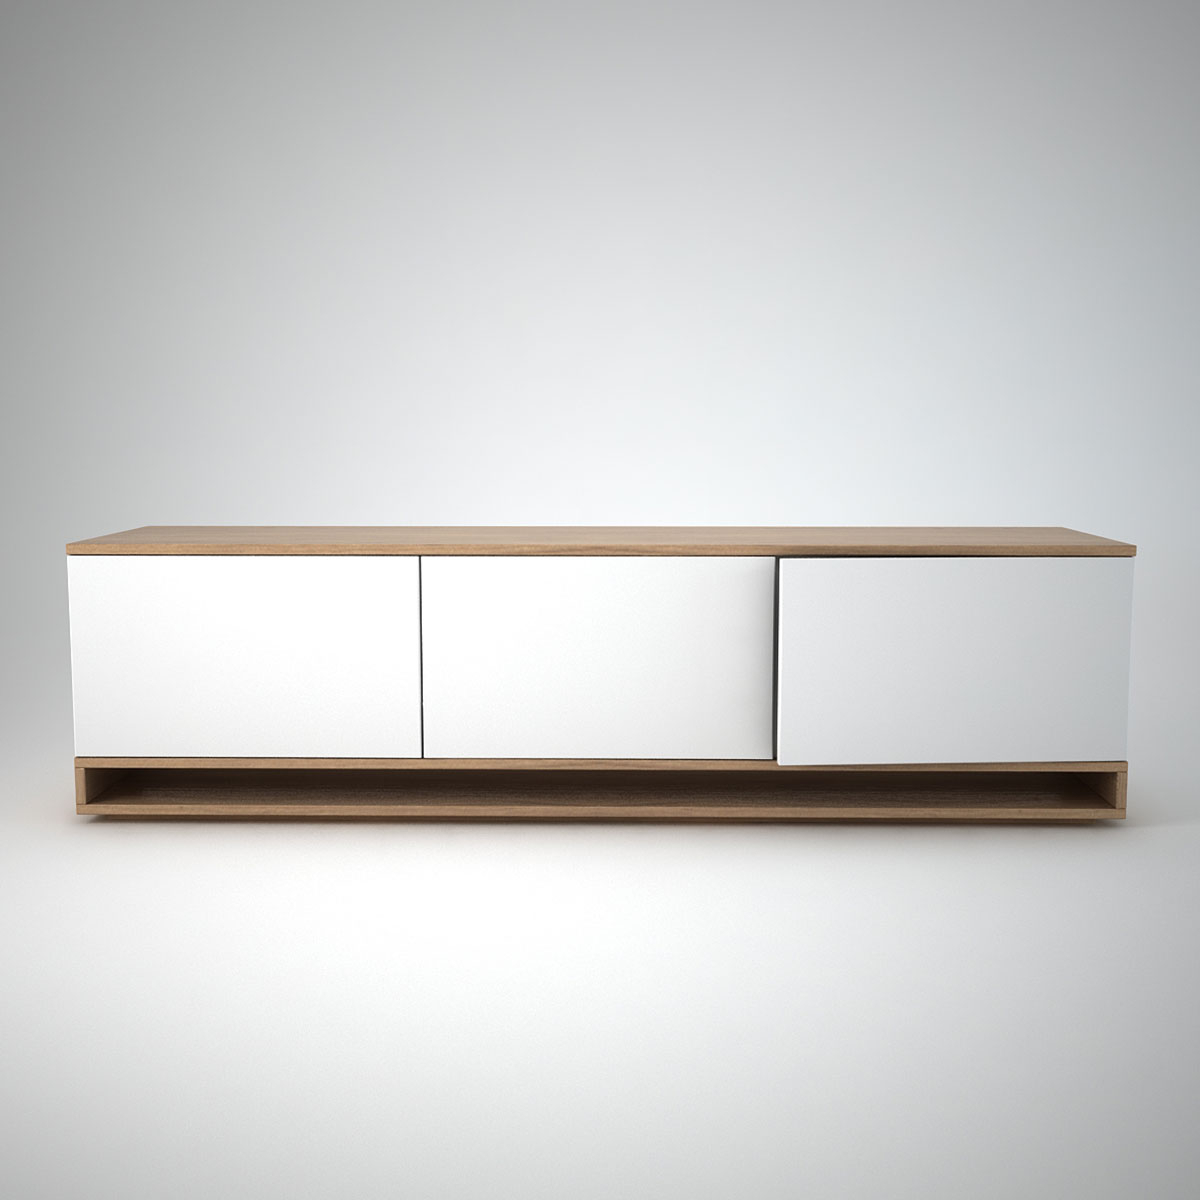 Harlem Low Sideboard (3) White pertaining to Thite Sideboards (Image 13 of 30)